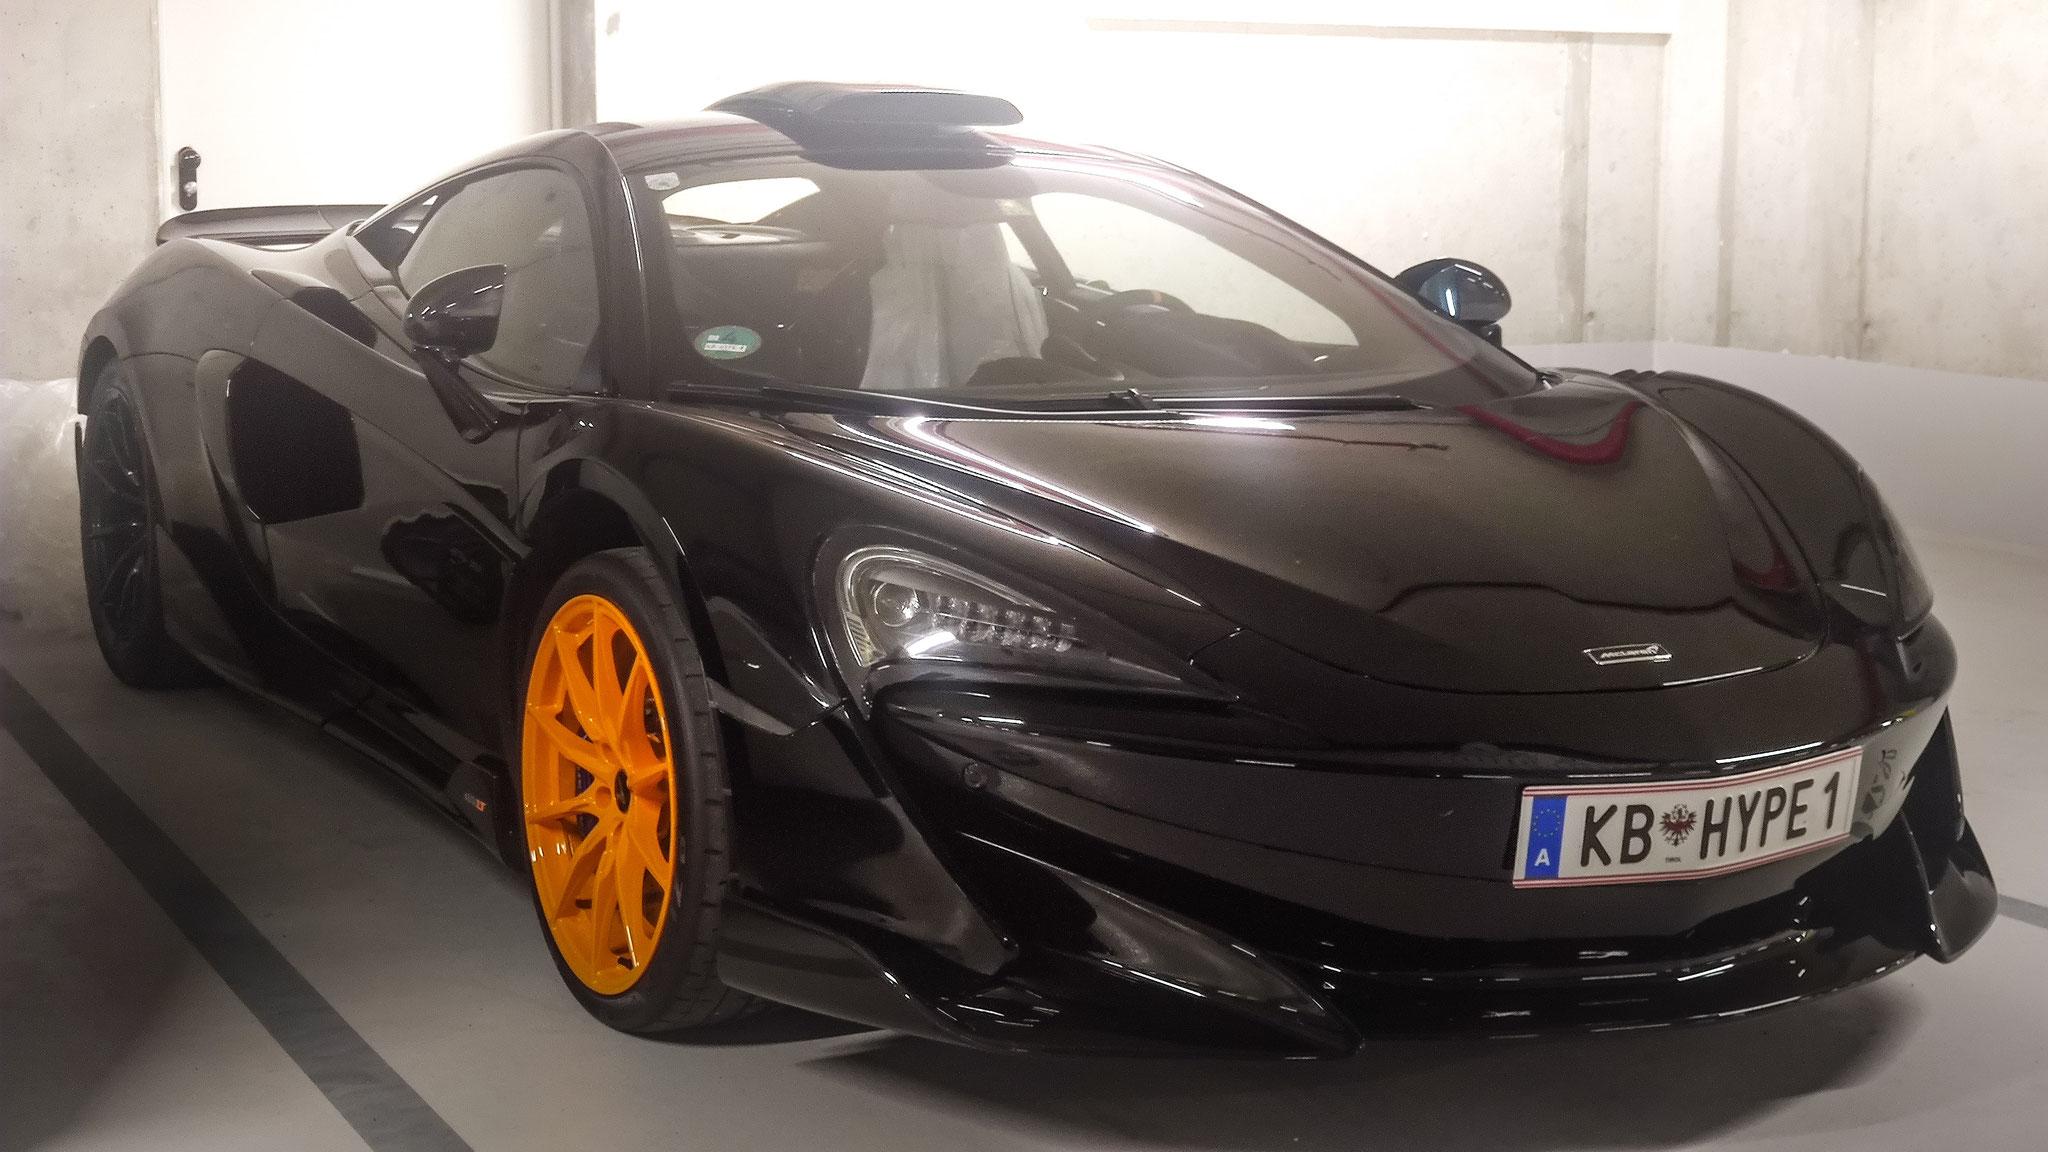 McLaren 600LT - KB-HYPE-1 (AUT)